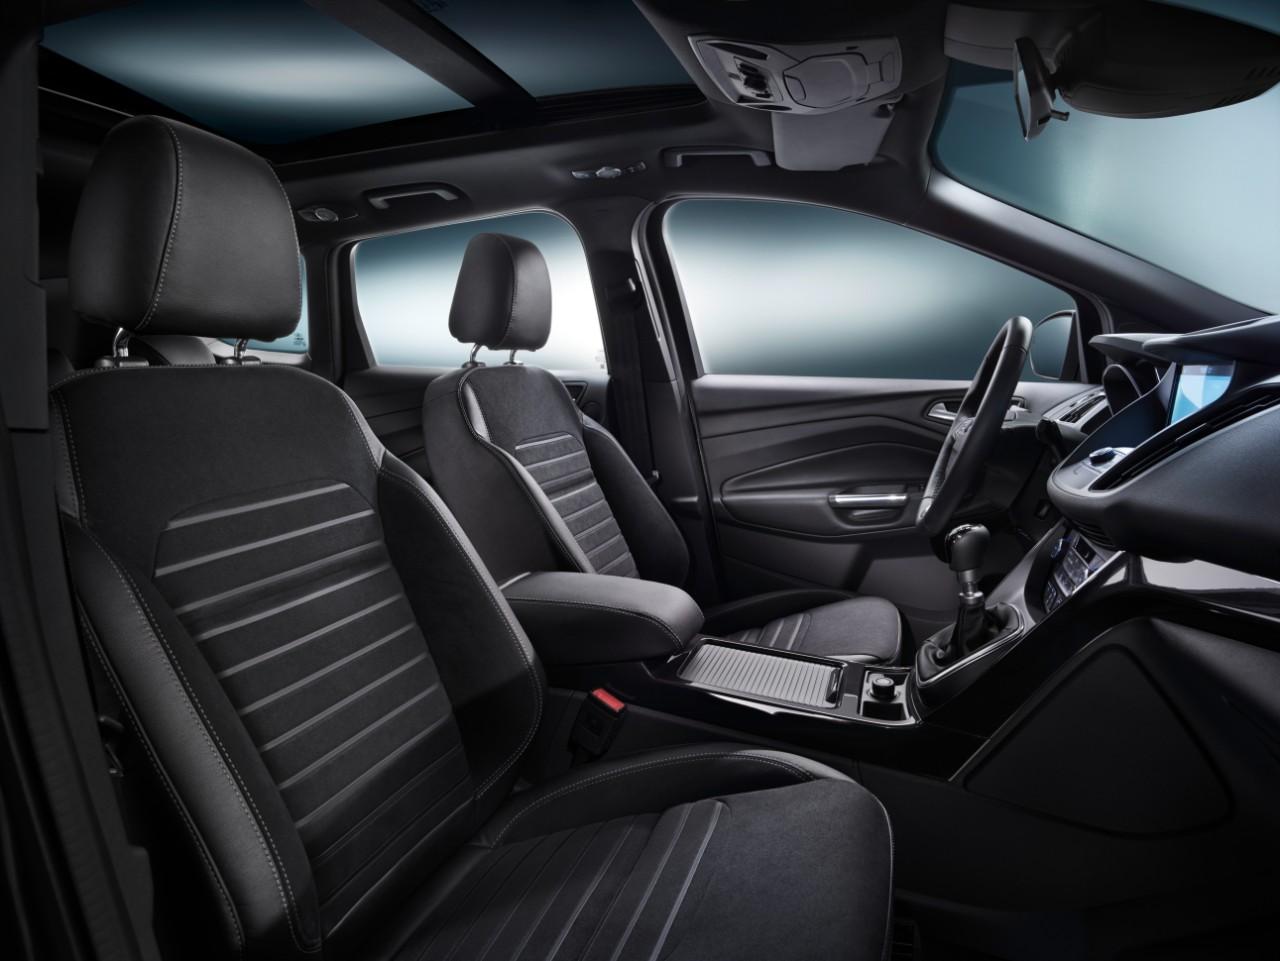 FORD KUGA MS InteriorSitze 11 eciRGB Η Ford Αποκαλύπτει το Νέο Kuga με πληθώρα νέων τεχνολογιών και με νέο κινητήρα 1.5L TDCi diesel 120 ίππων